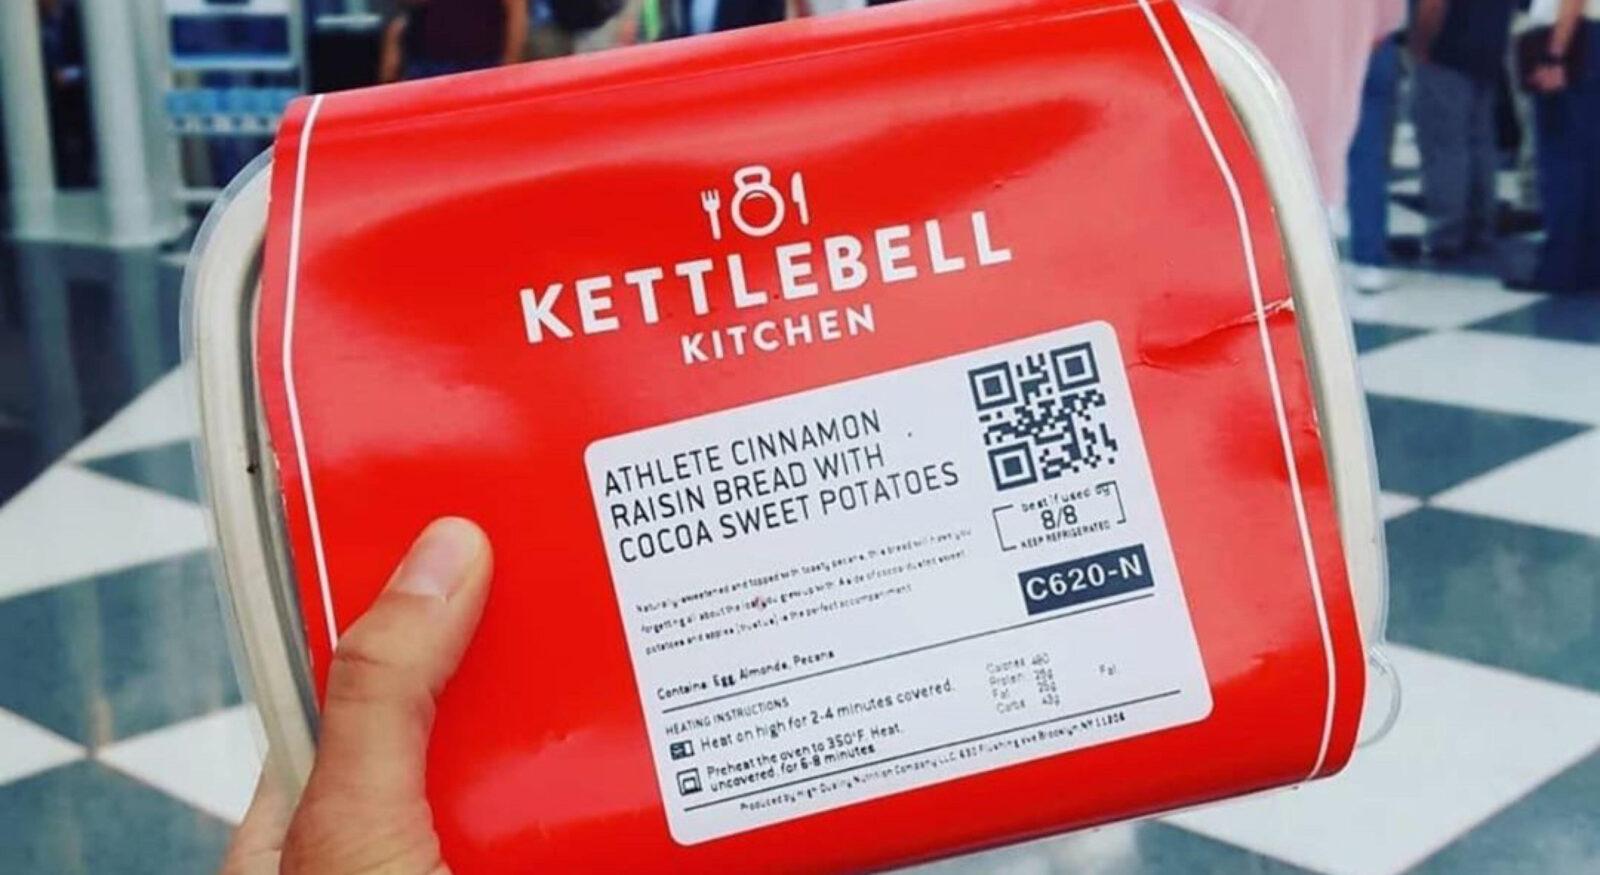 Kettlebell Kitchen Shuts Down Meal Prep